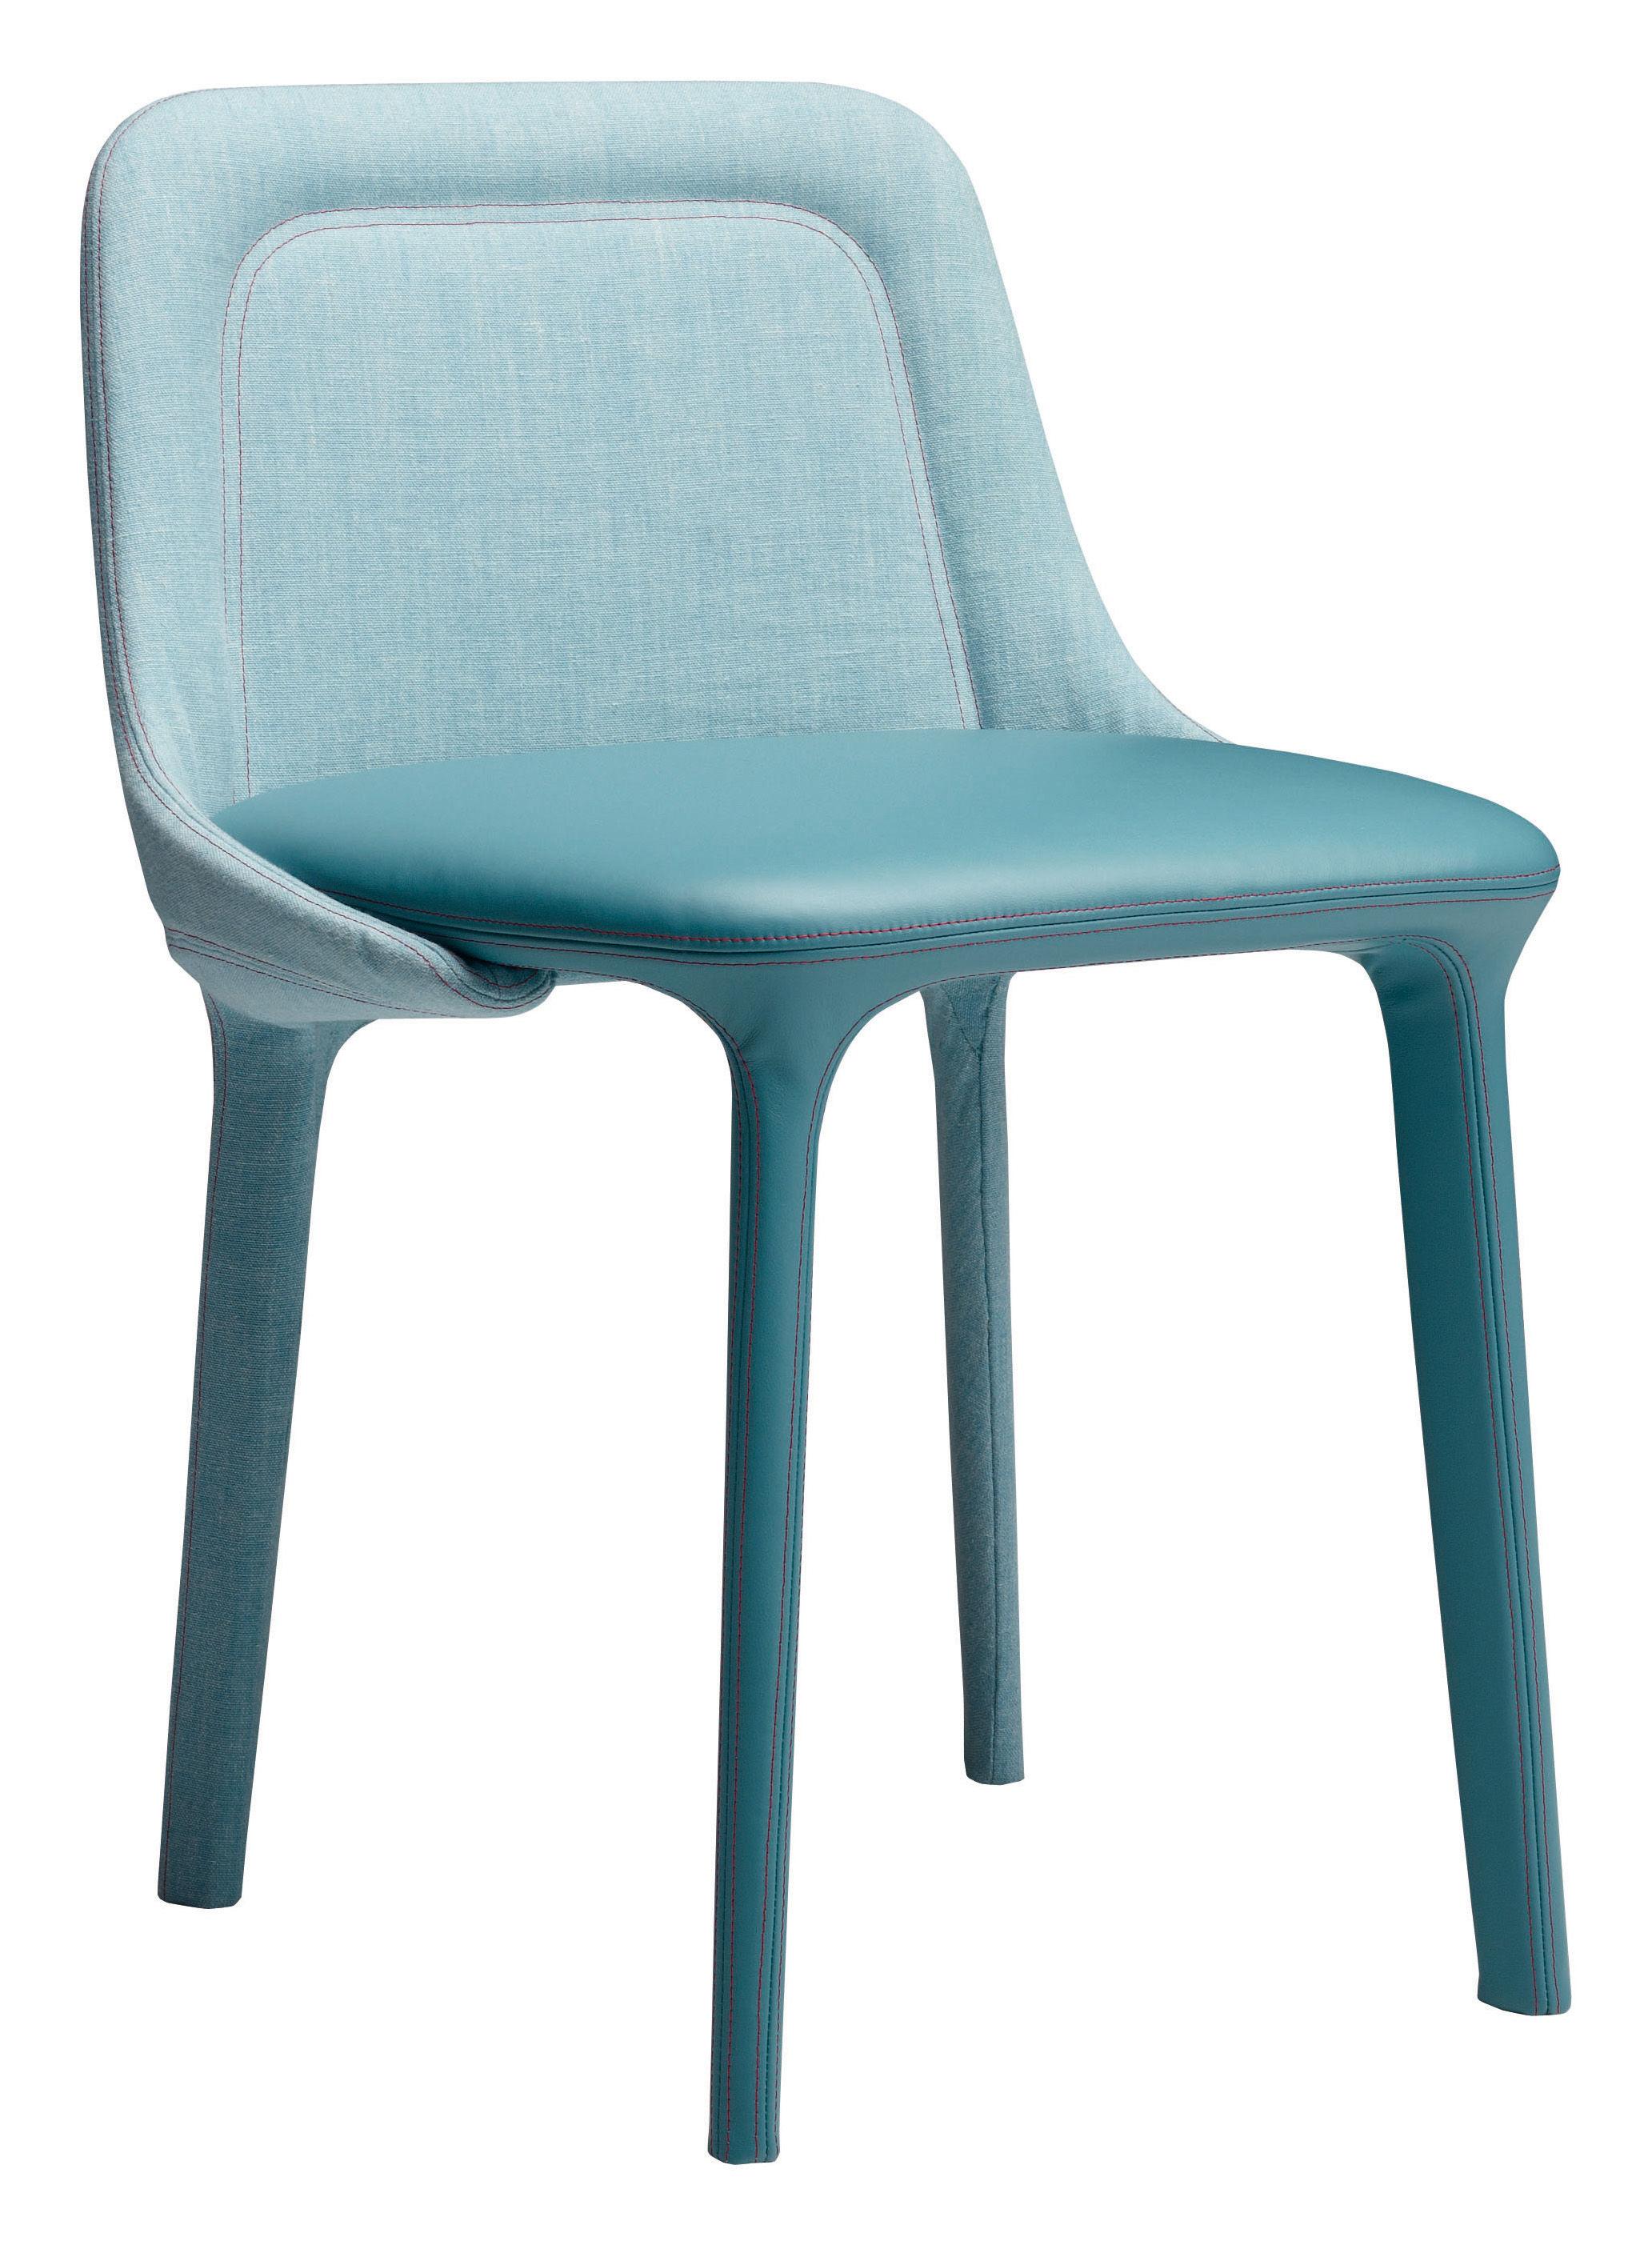 Möbel - Stühle  - Lepel Gepolsterter Stuhl / Stoffbezug & Leder - Casamania - Sitzfläche blaues Leder (Florida) / Rückenlehne blau-melierter Stoff (Willow) - Kvadrat-Gewebe, Leder, Metall, Polyurethan-Schaum